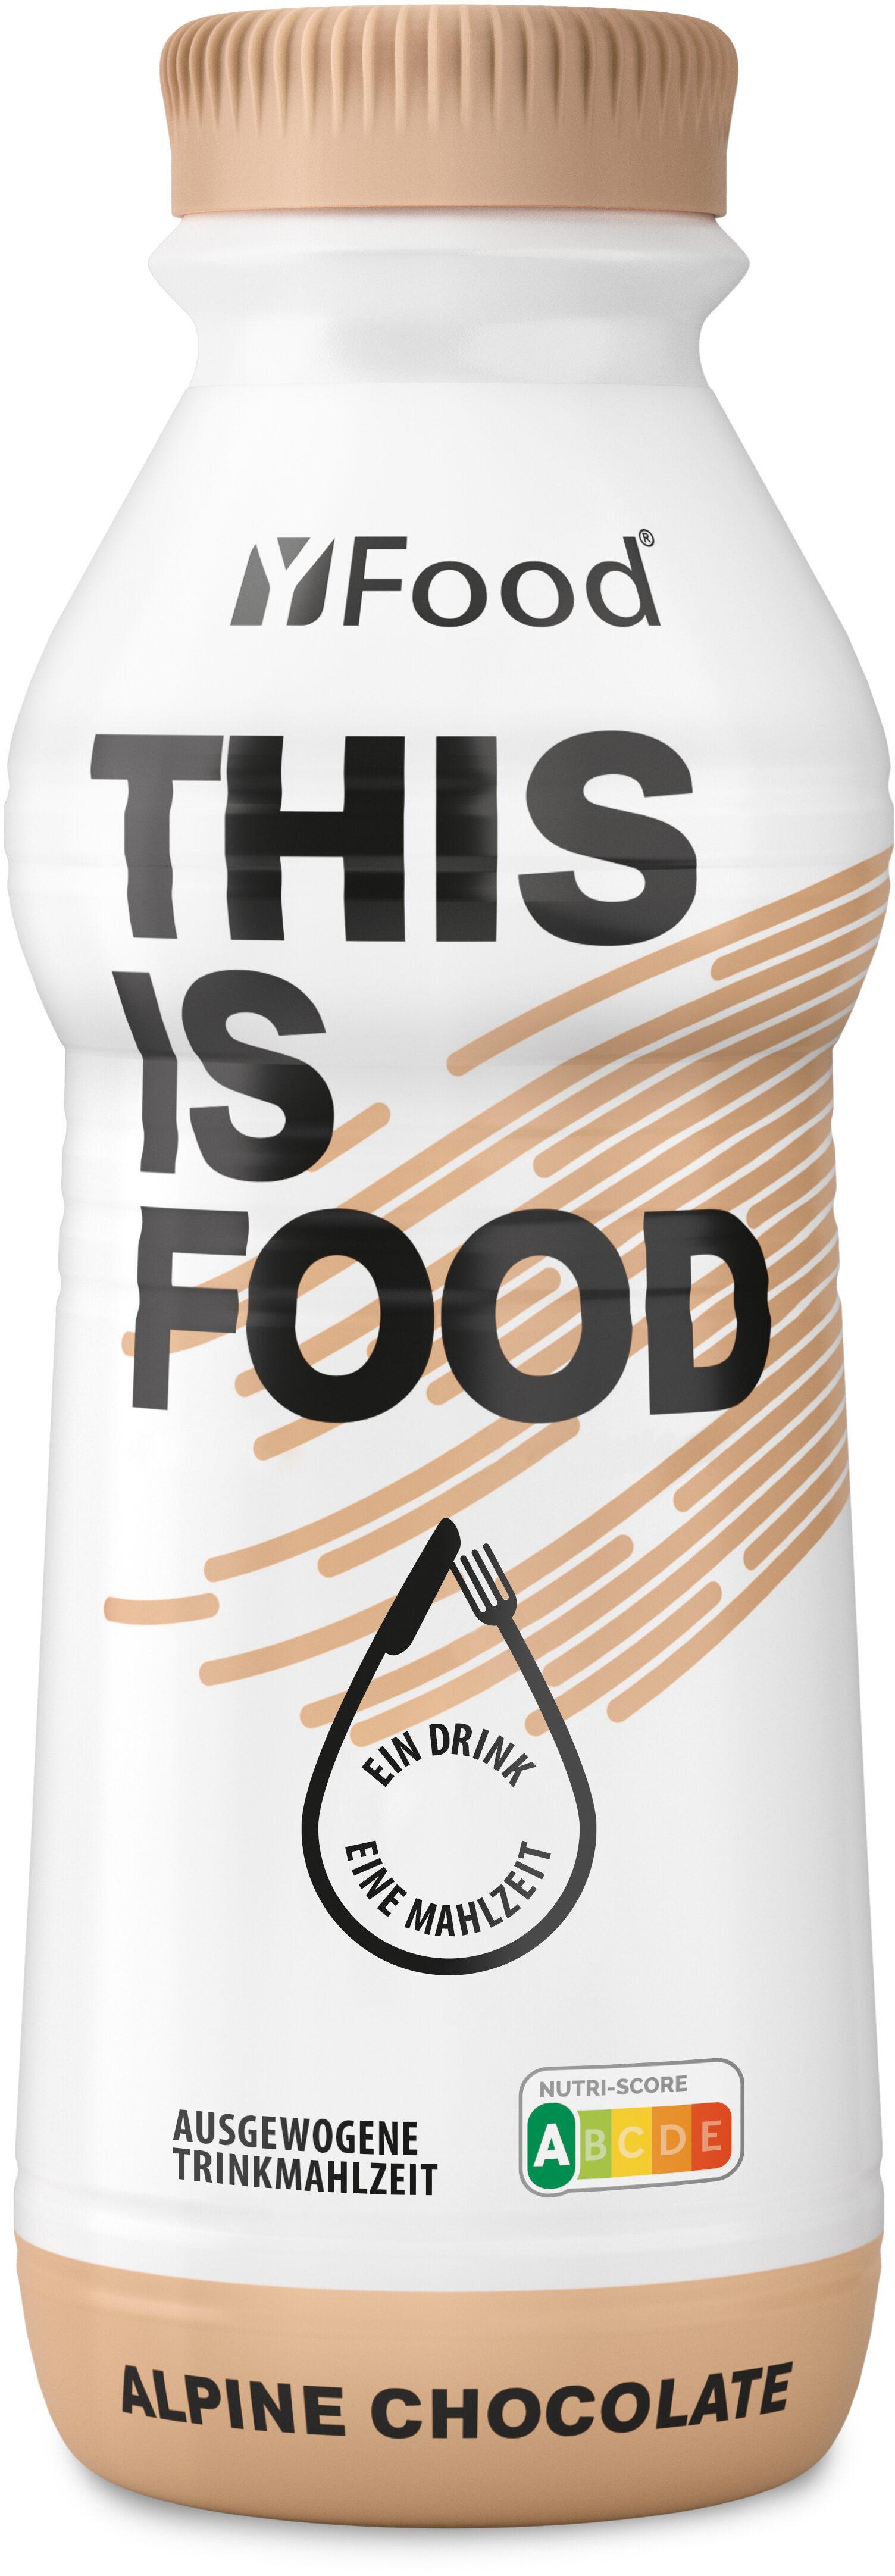 YFood Drink Alpine Chocolate - Produkt - de